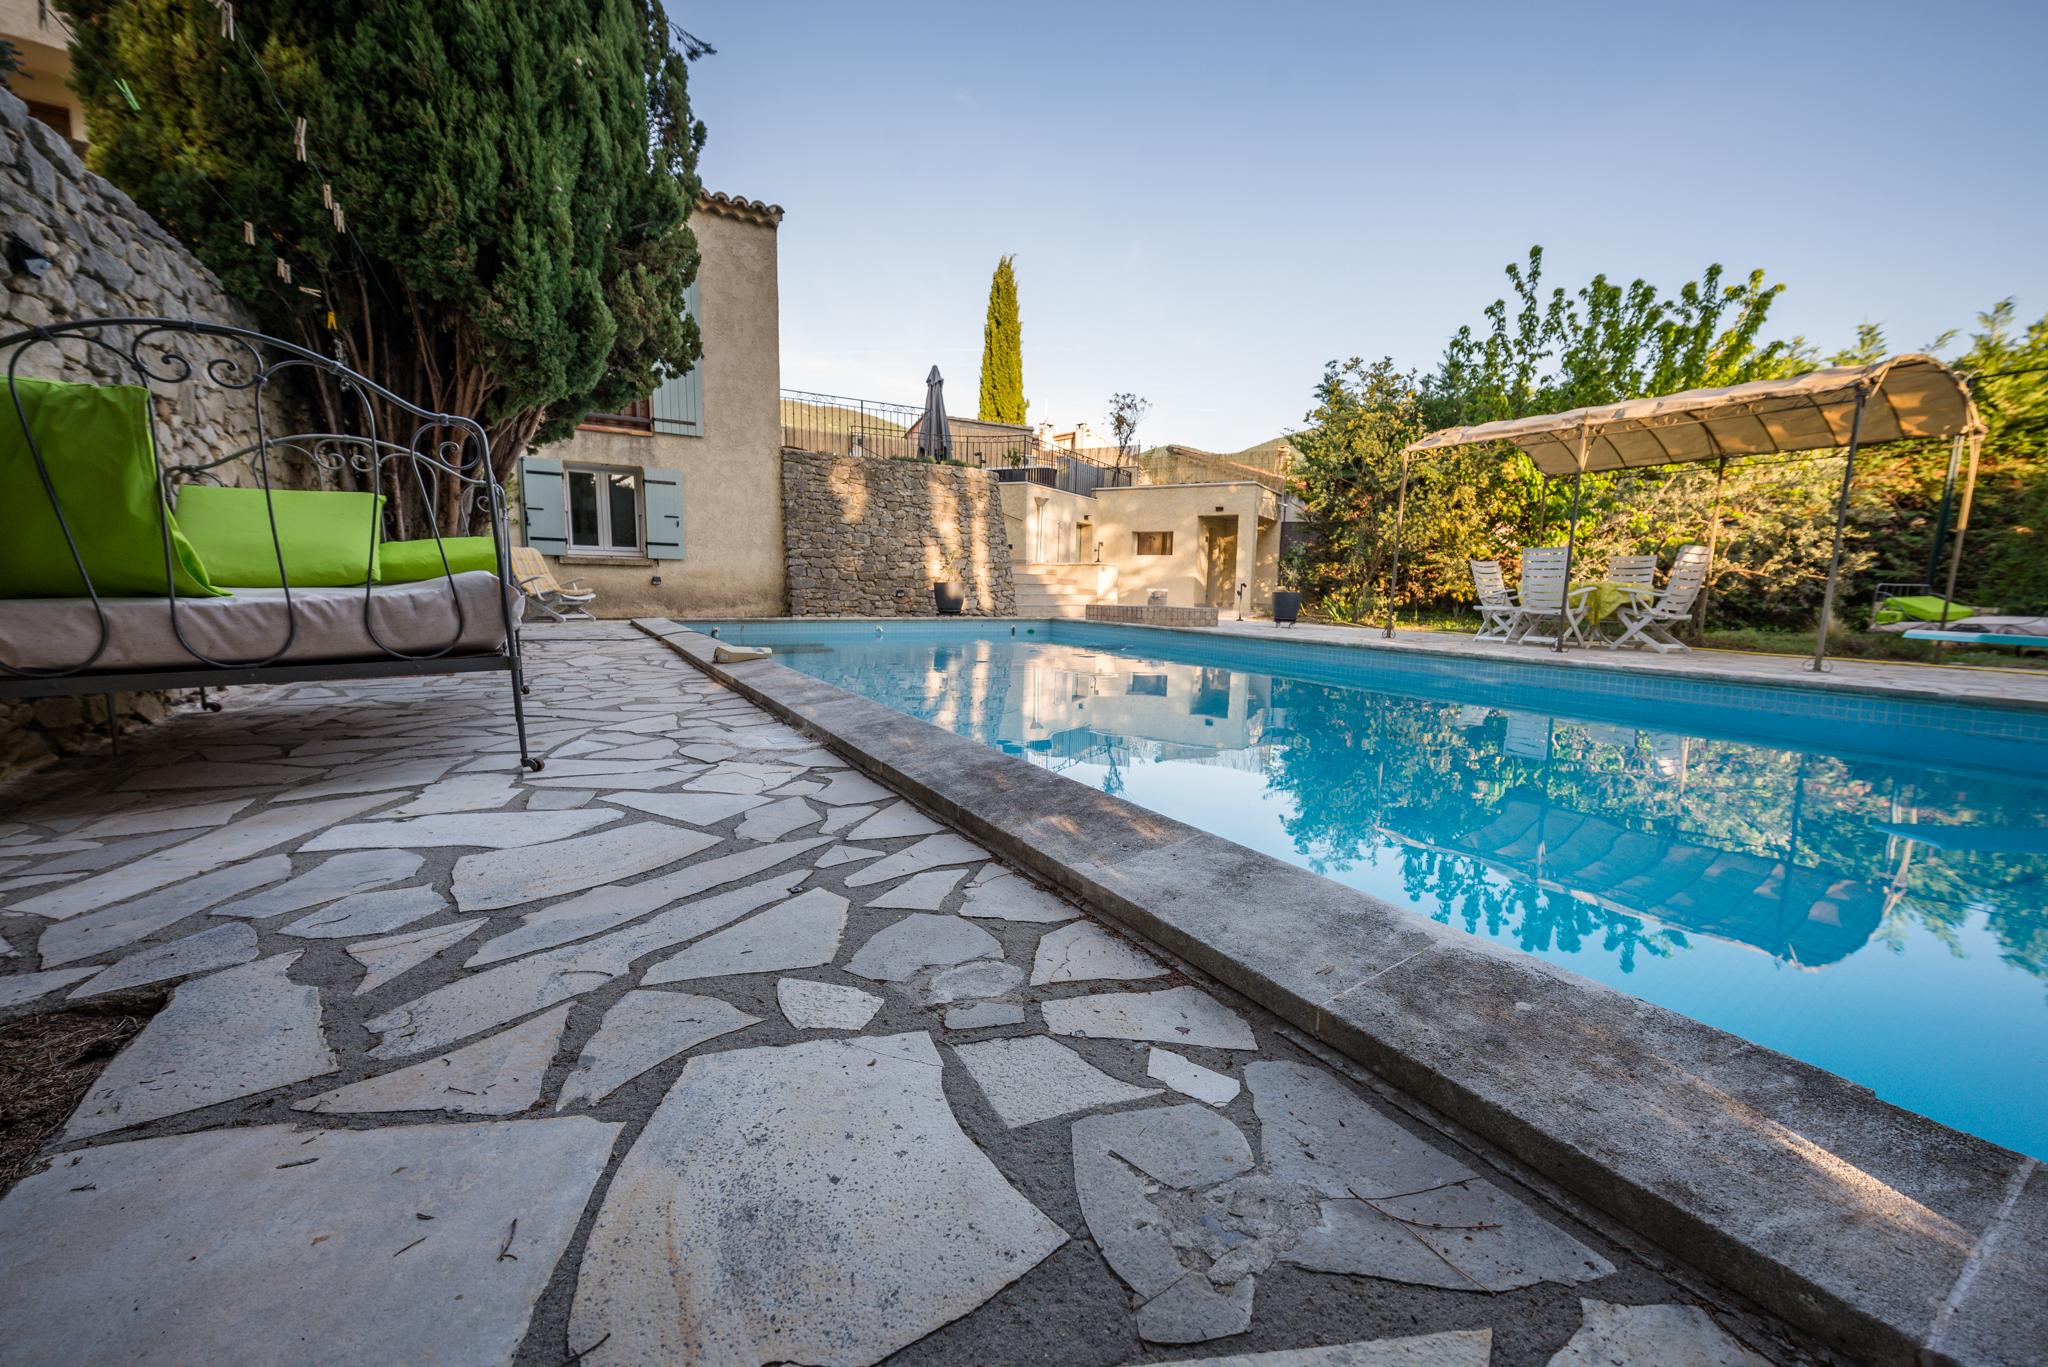 ferienhaus-Nyons-pool-DSC_4680.jpg